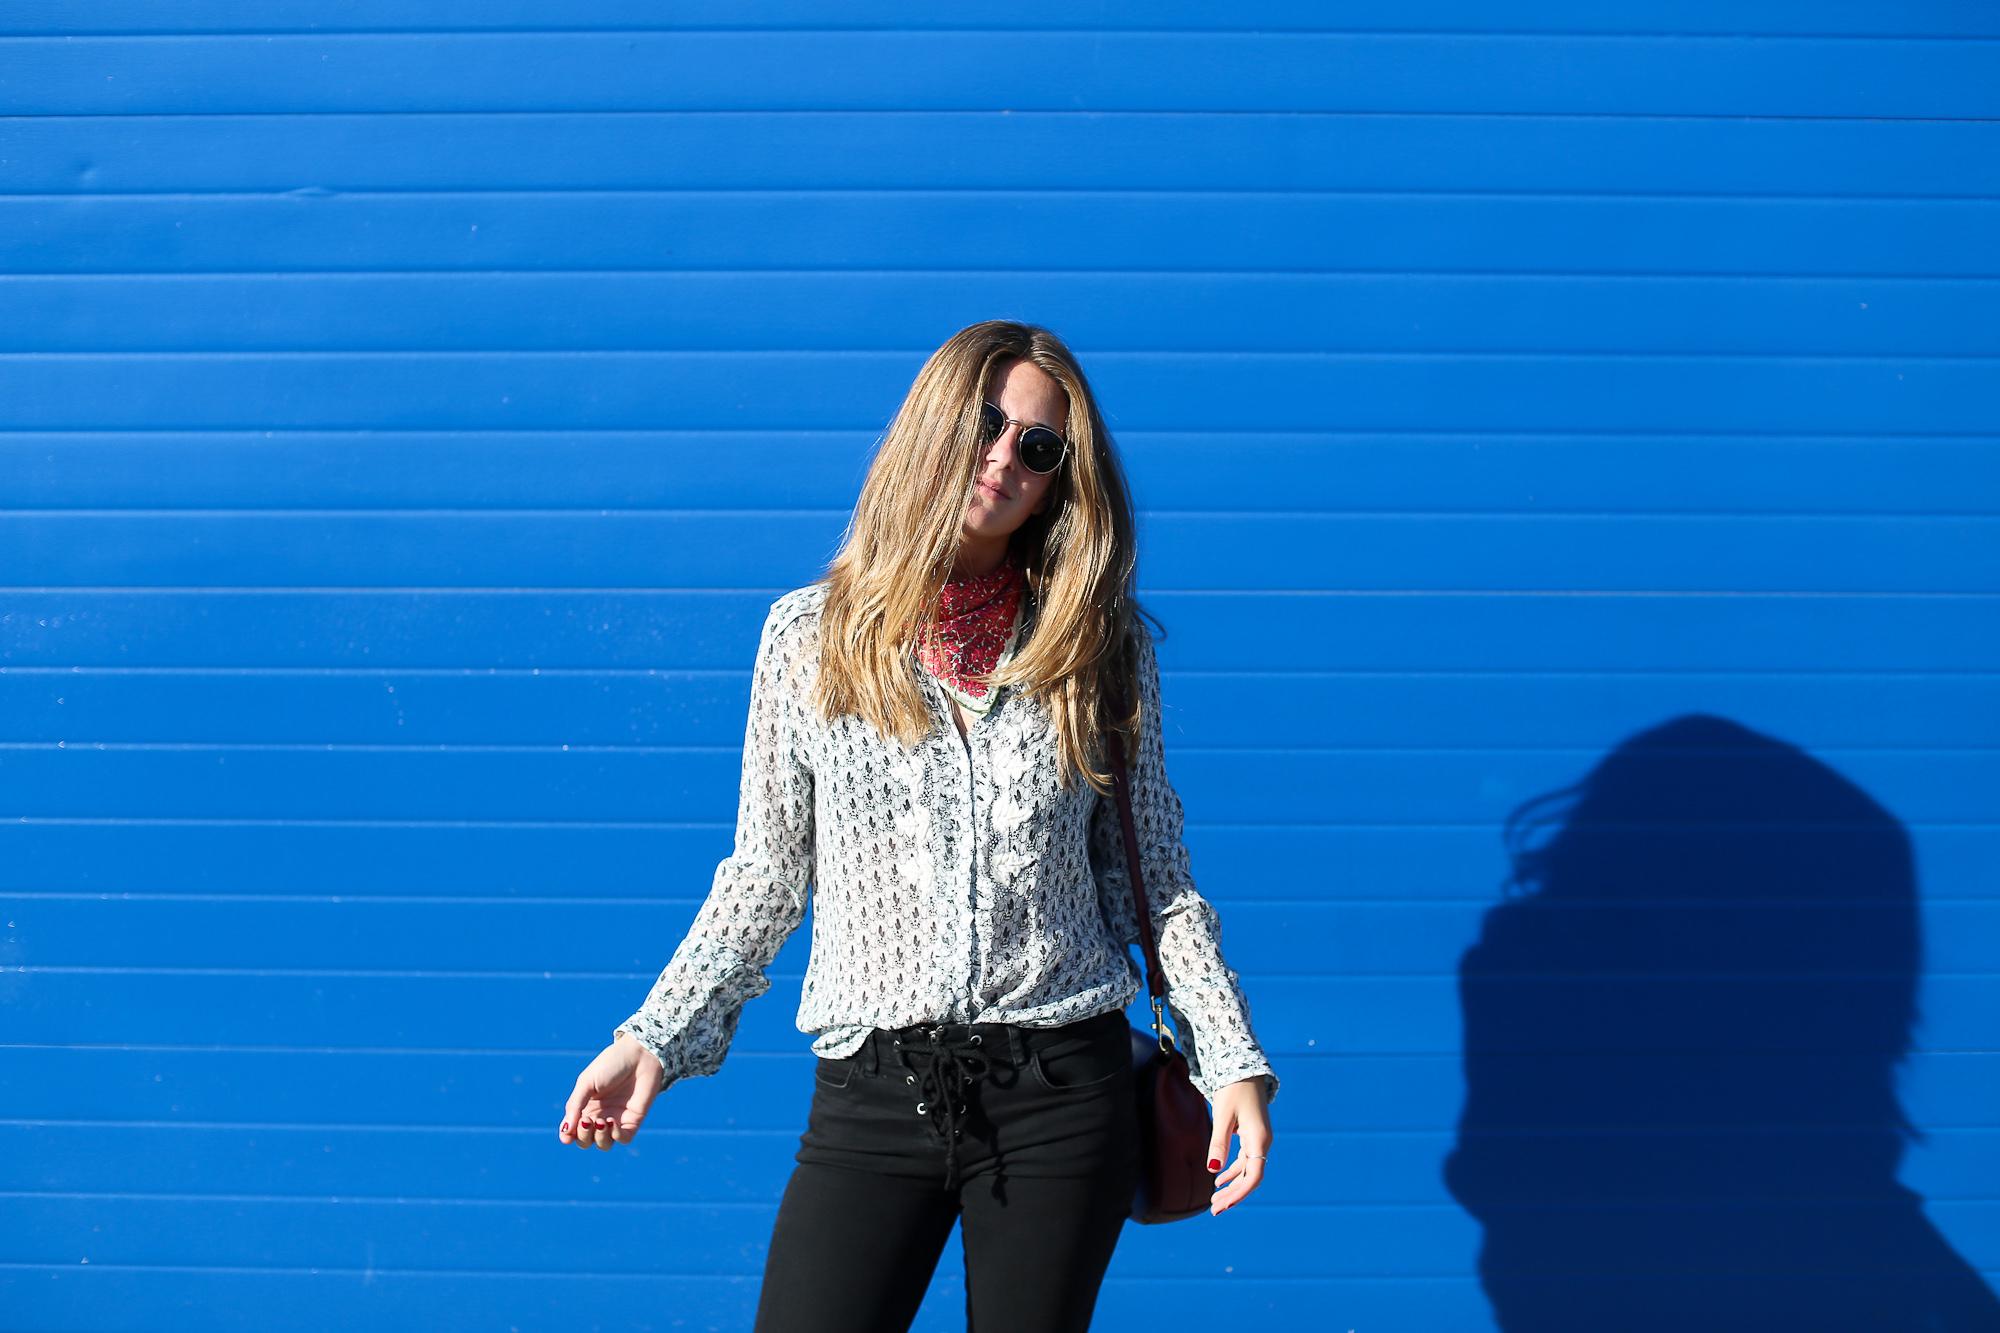 Clochet_streetstyle_fashionblogger_concordneo_adidasstansmith_mangomarantjeans-7